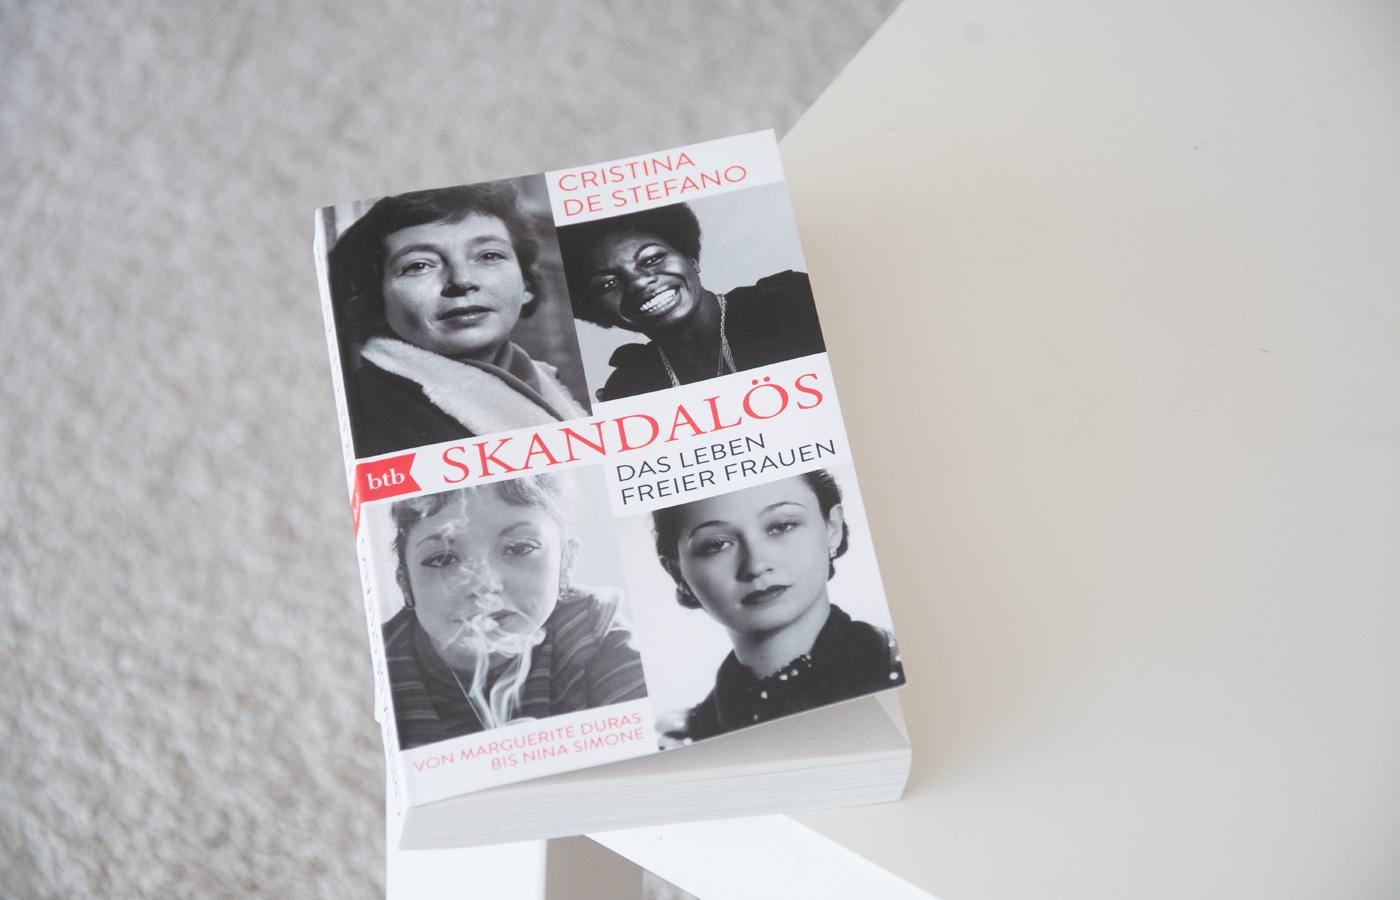 »Skandalös – Das Leben freier Frauen« von Cristina De Stefano